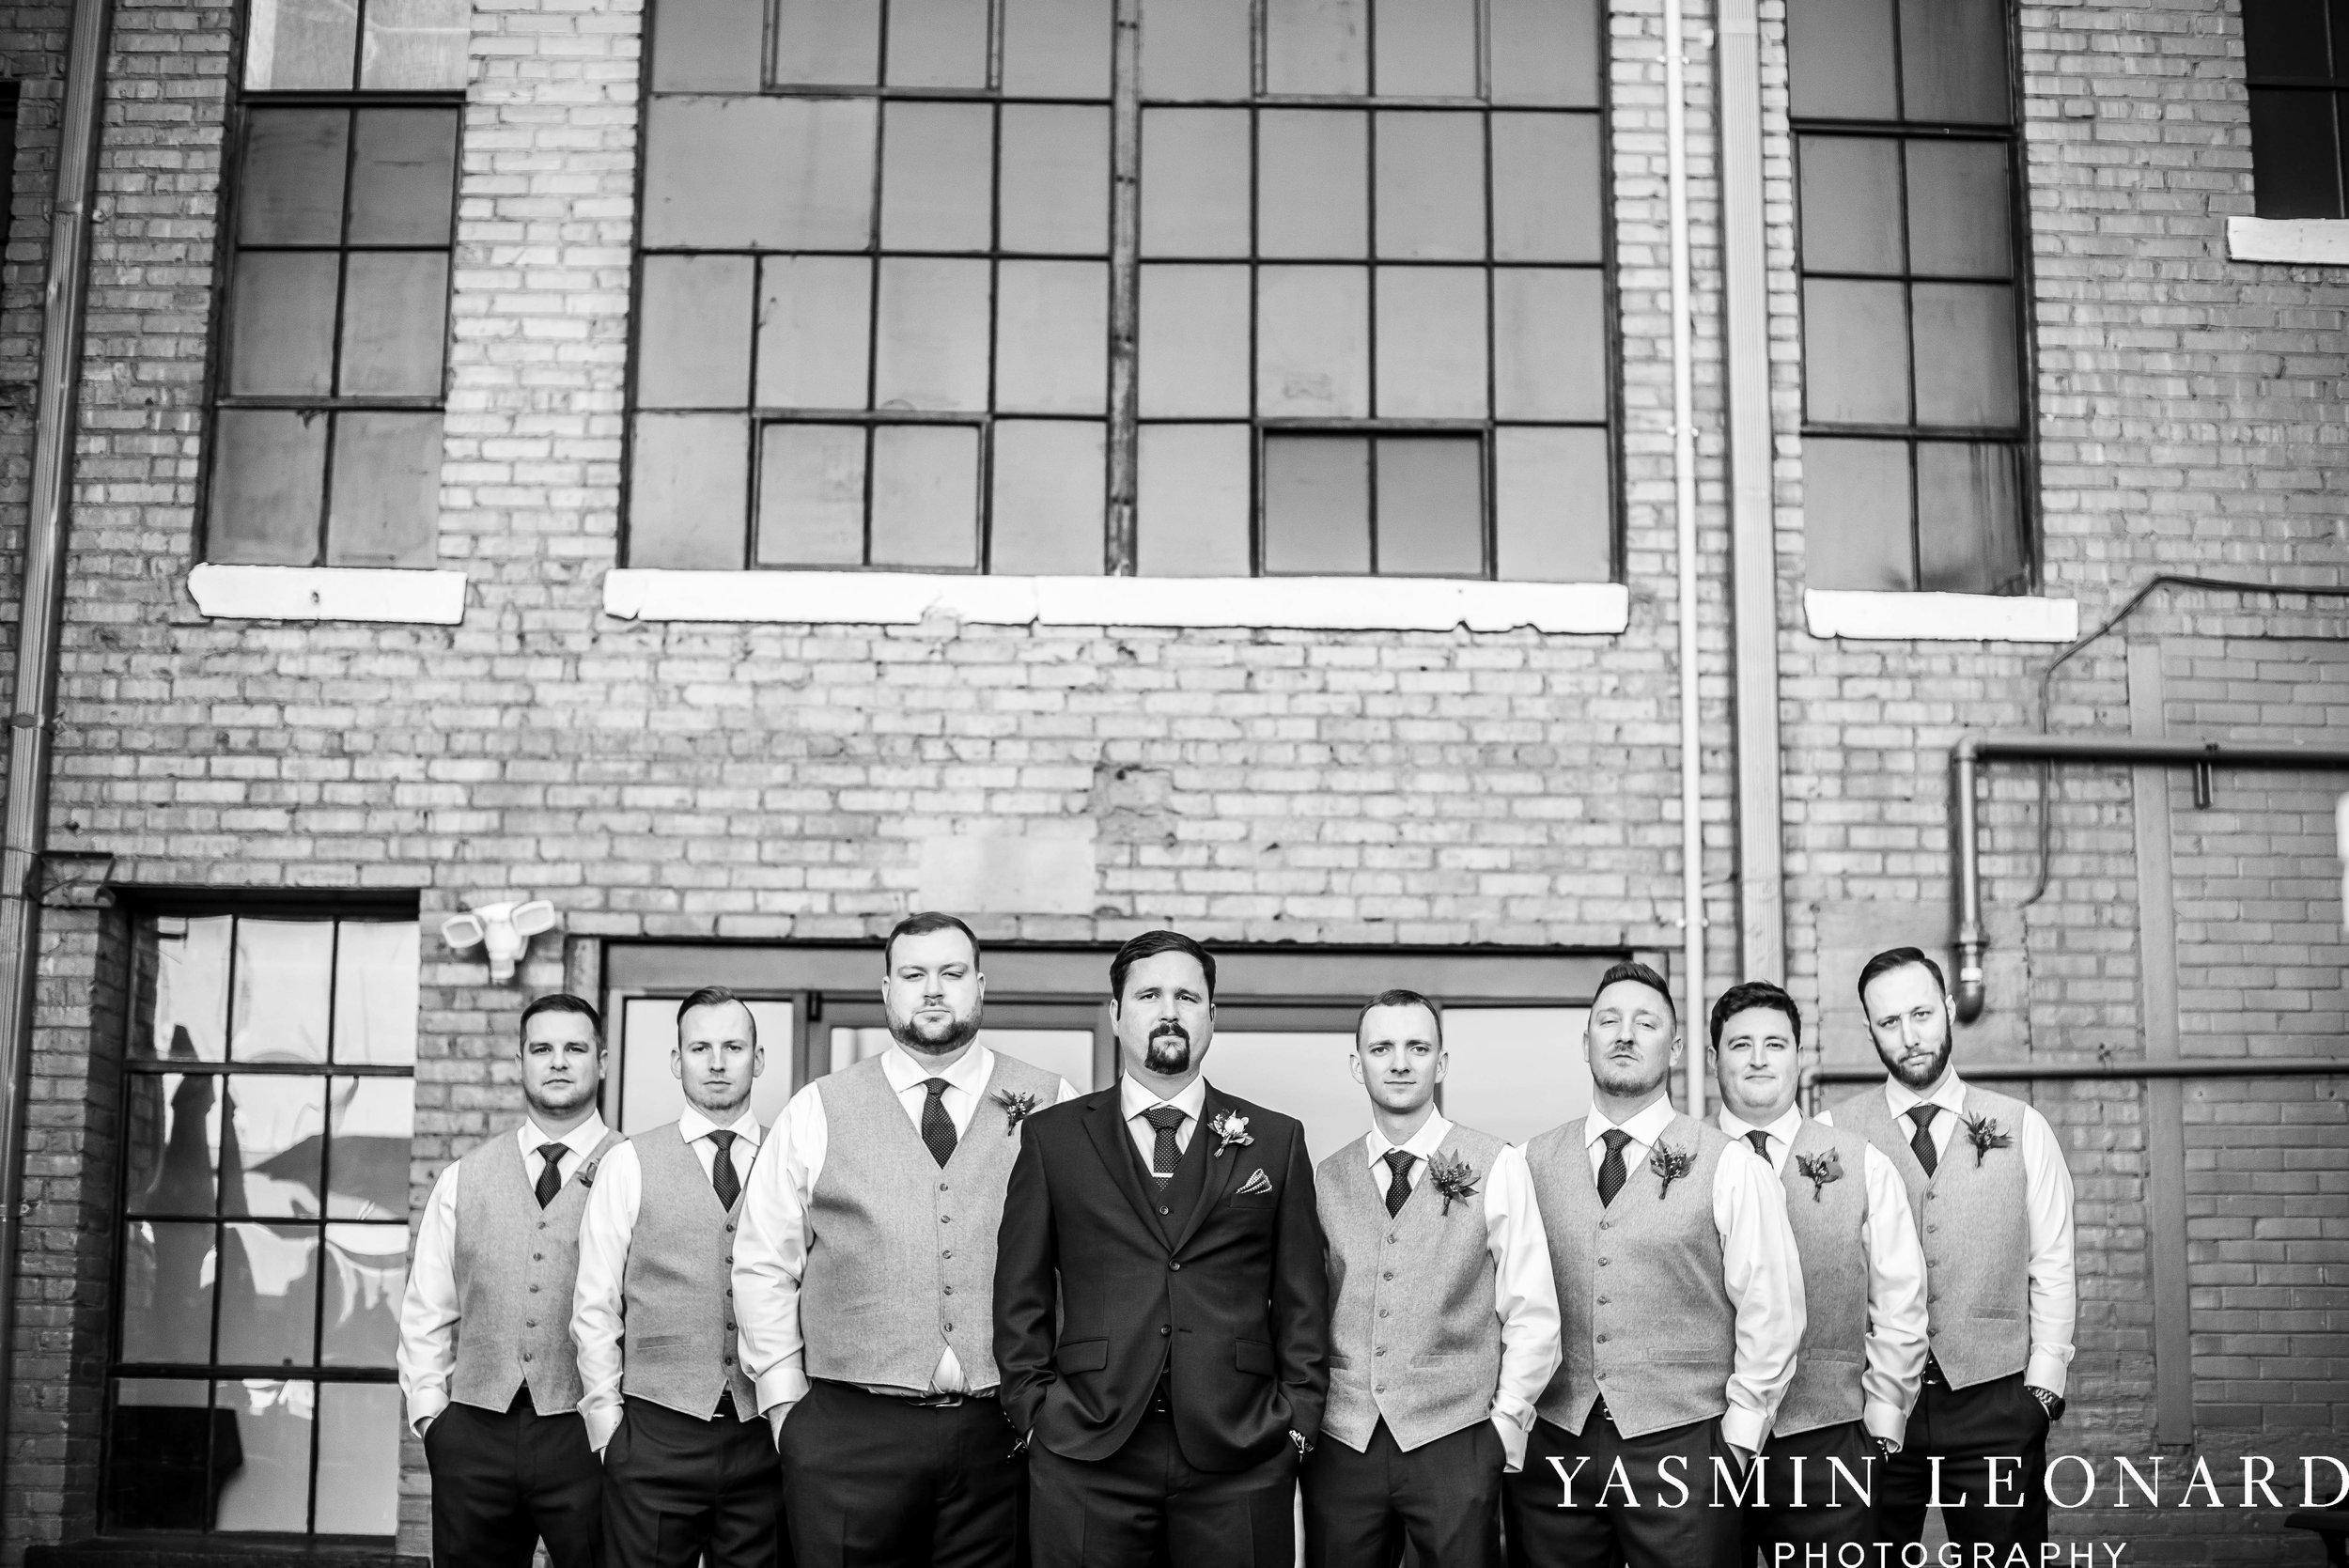 Rebekah and Matt - 105 Worth Event Centre - Yasmin Leonard Photography - Asheboro Wedding - NC Wedding - High Point Weddings - Triad Weddings - Winter Wedding-8.jpg